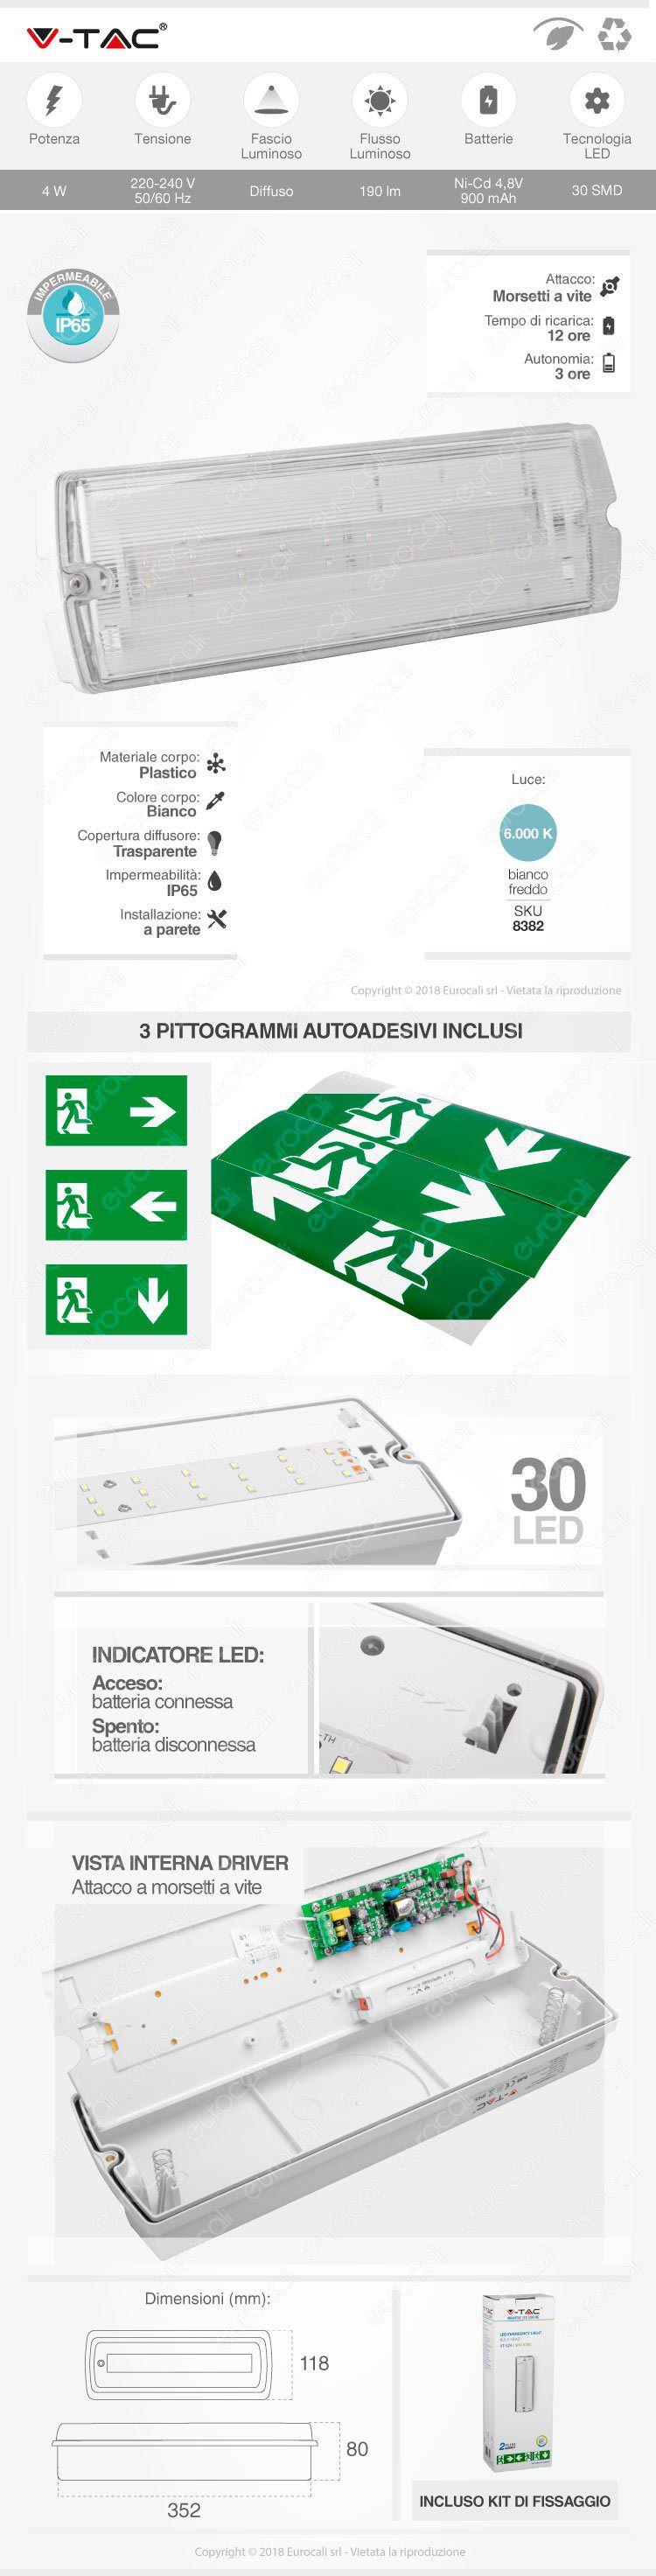 v-tac lampada d'emergenza